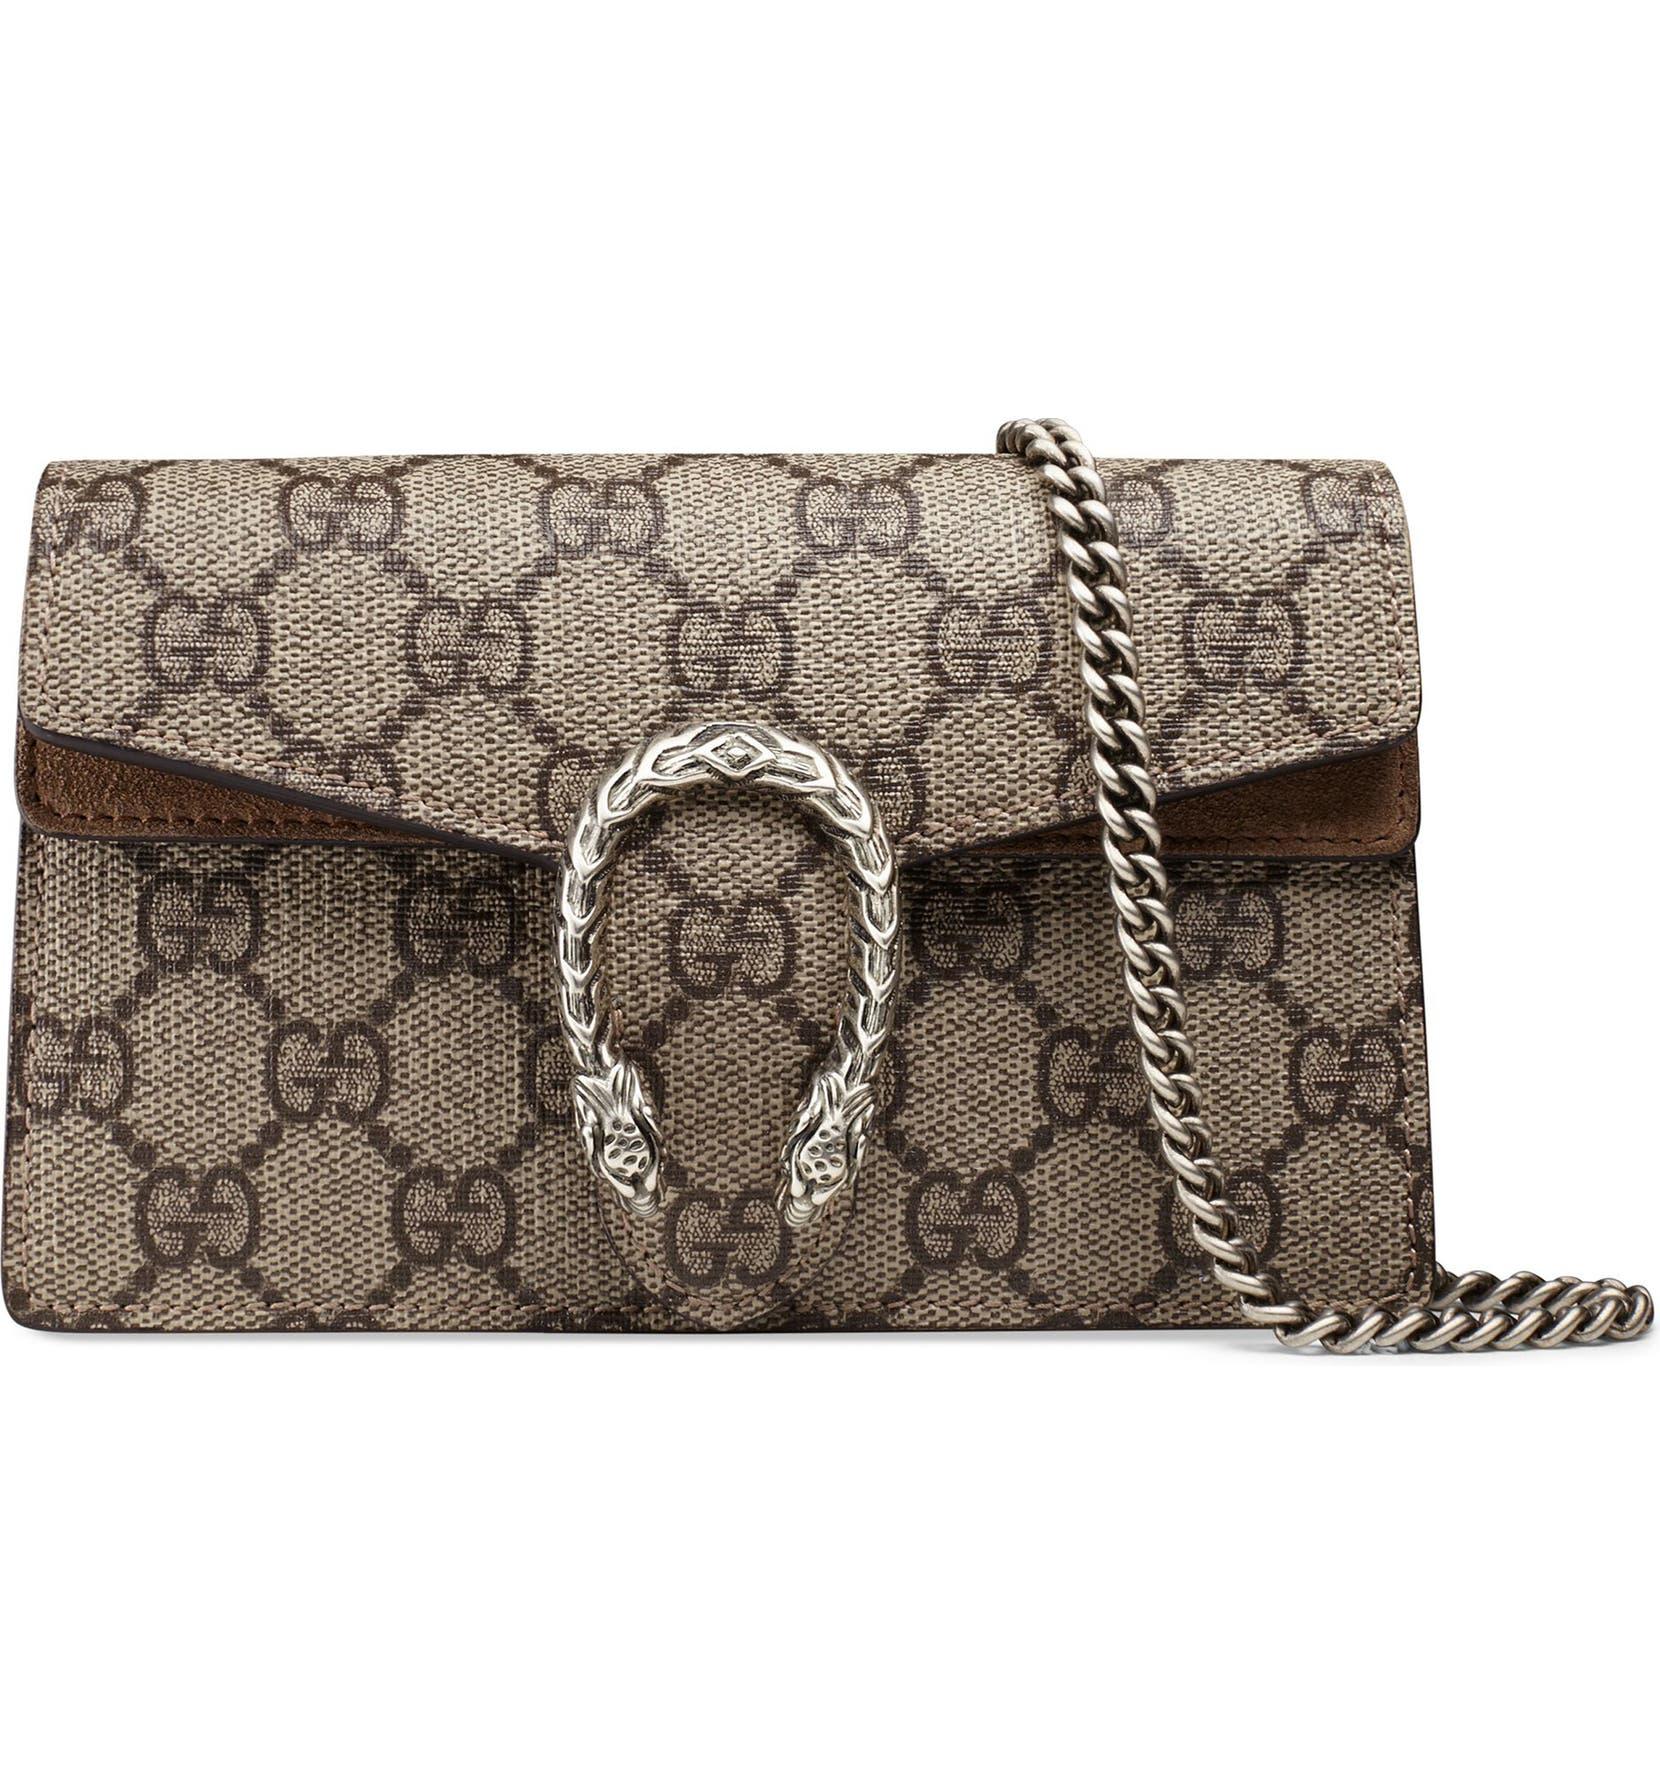 dee158d39 Gucci Super Mini Dionysus GG Supreme Canvas & Suede Shoulder Bag   Nordstrom